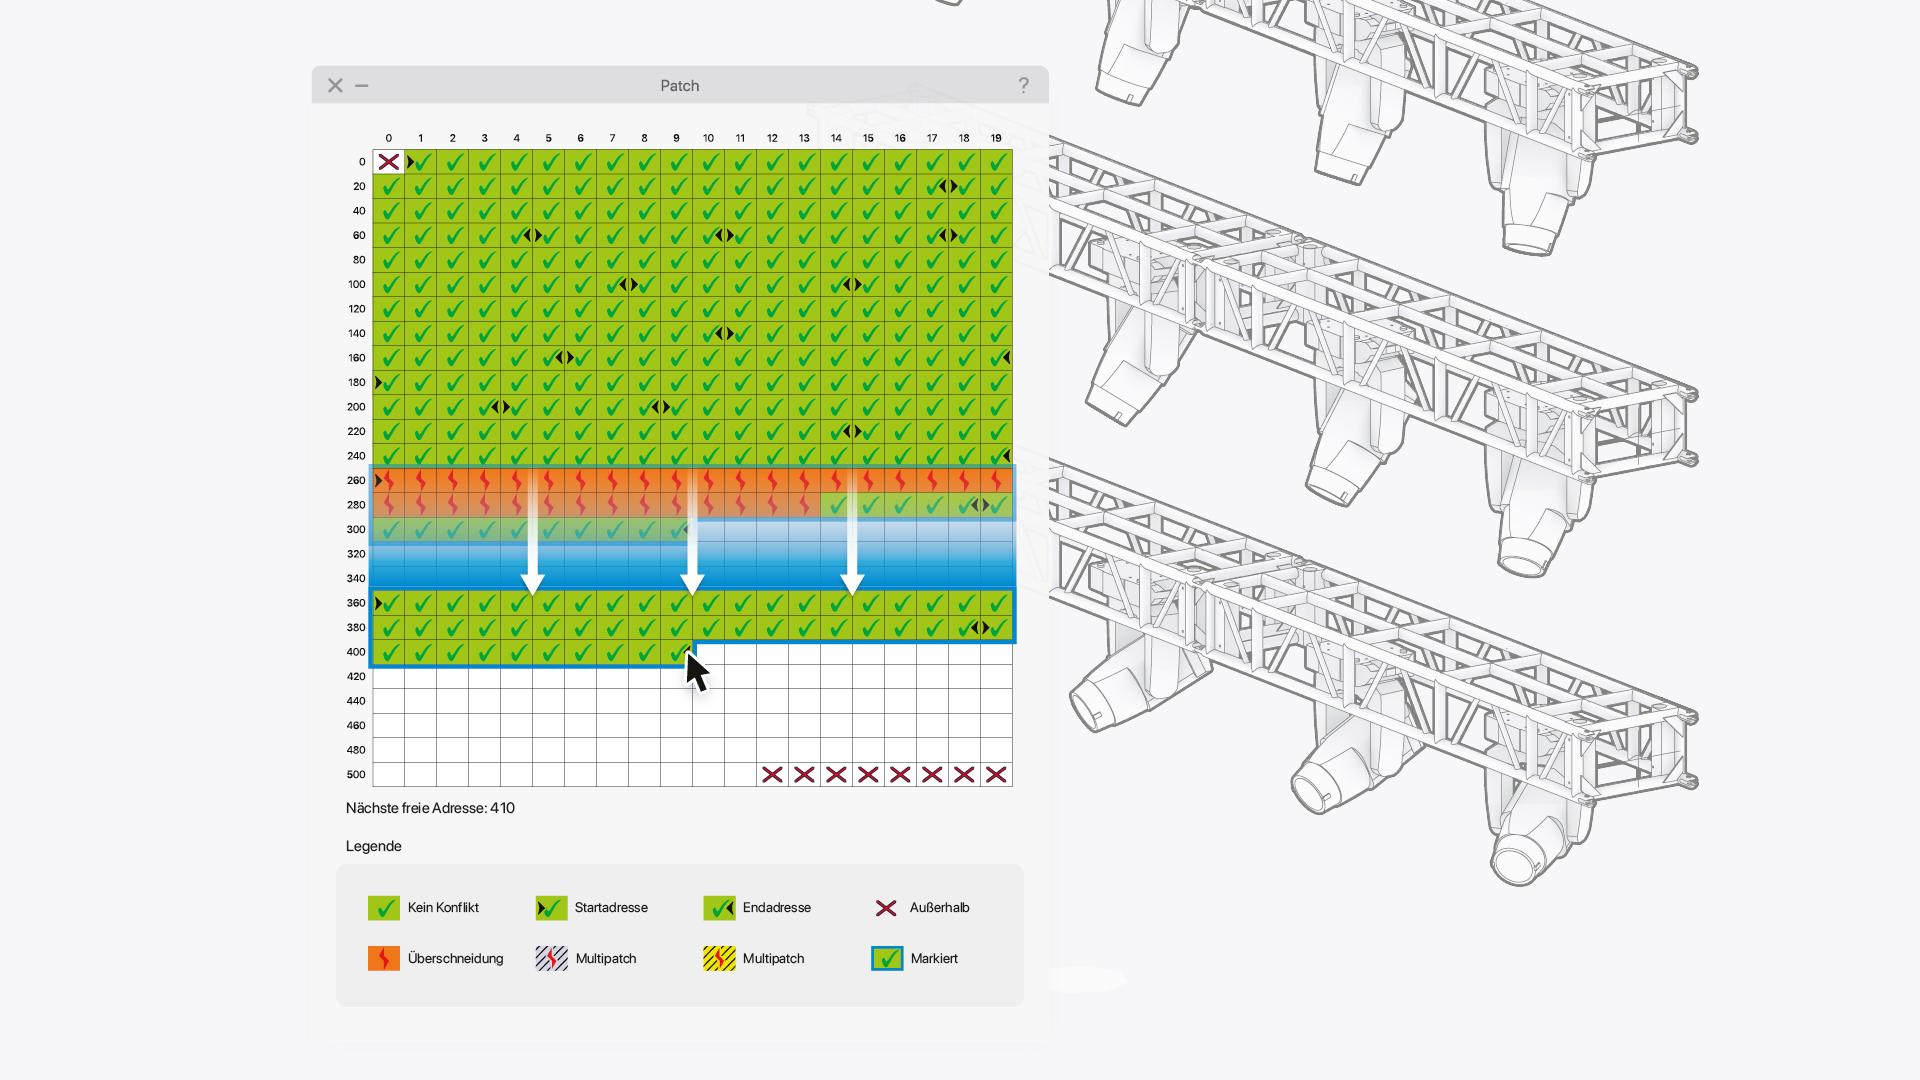 thumbnail-VWSL-neuerungen-dmx-patching-ohne-neu